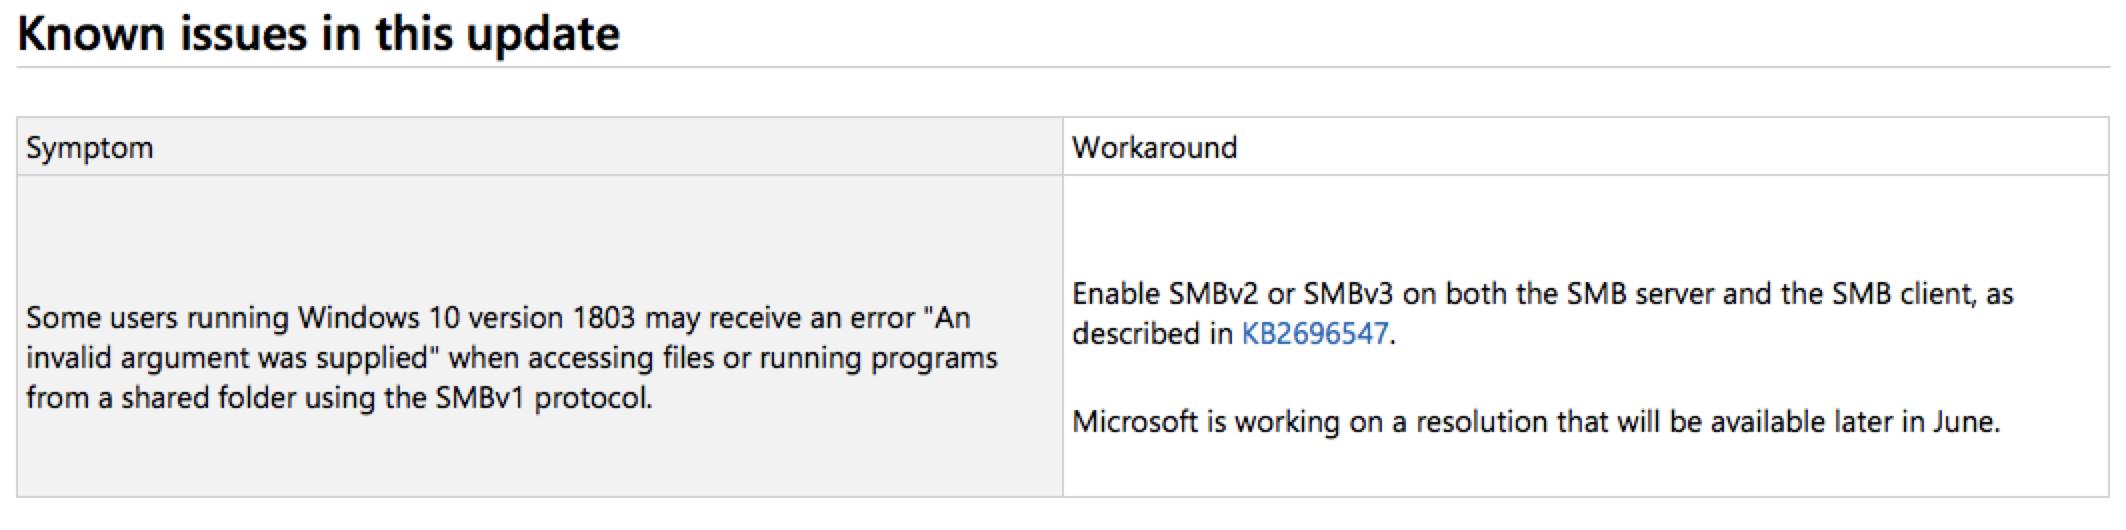 Microsoft known issue Windows 10 version 1803